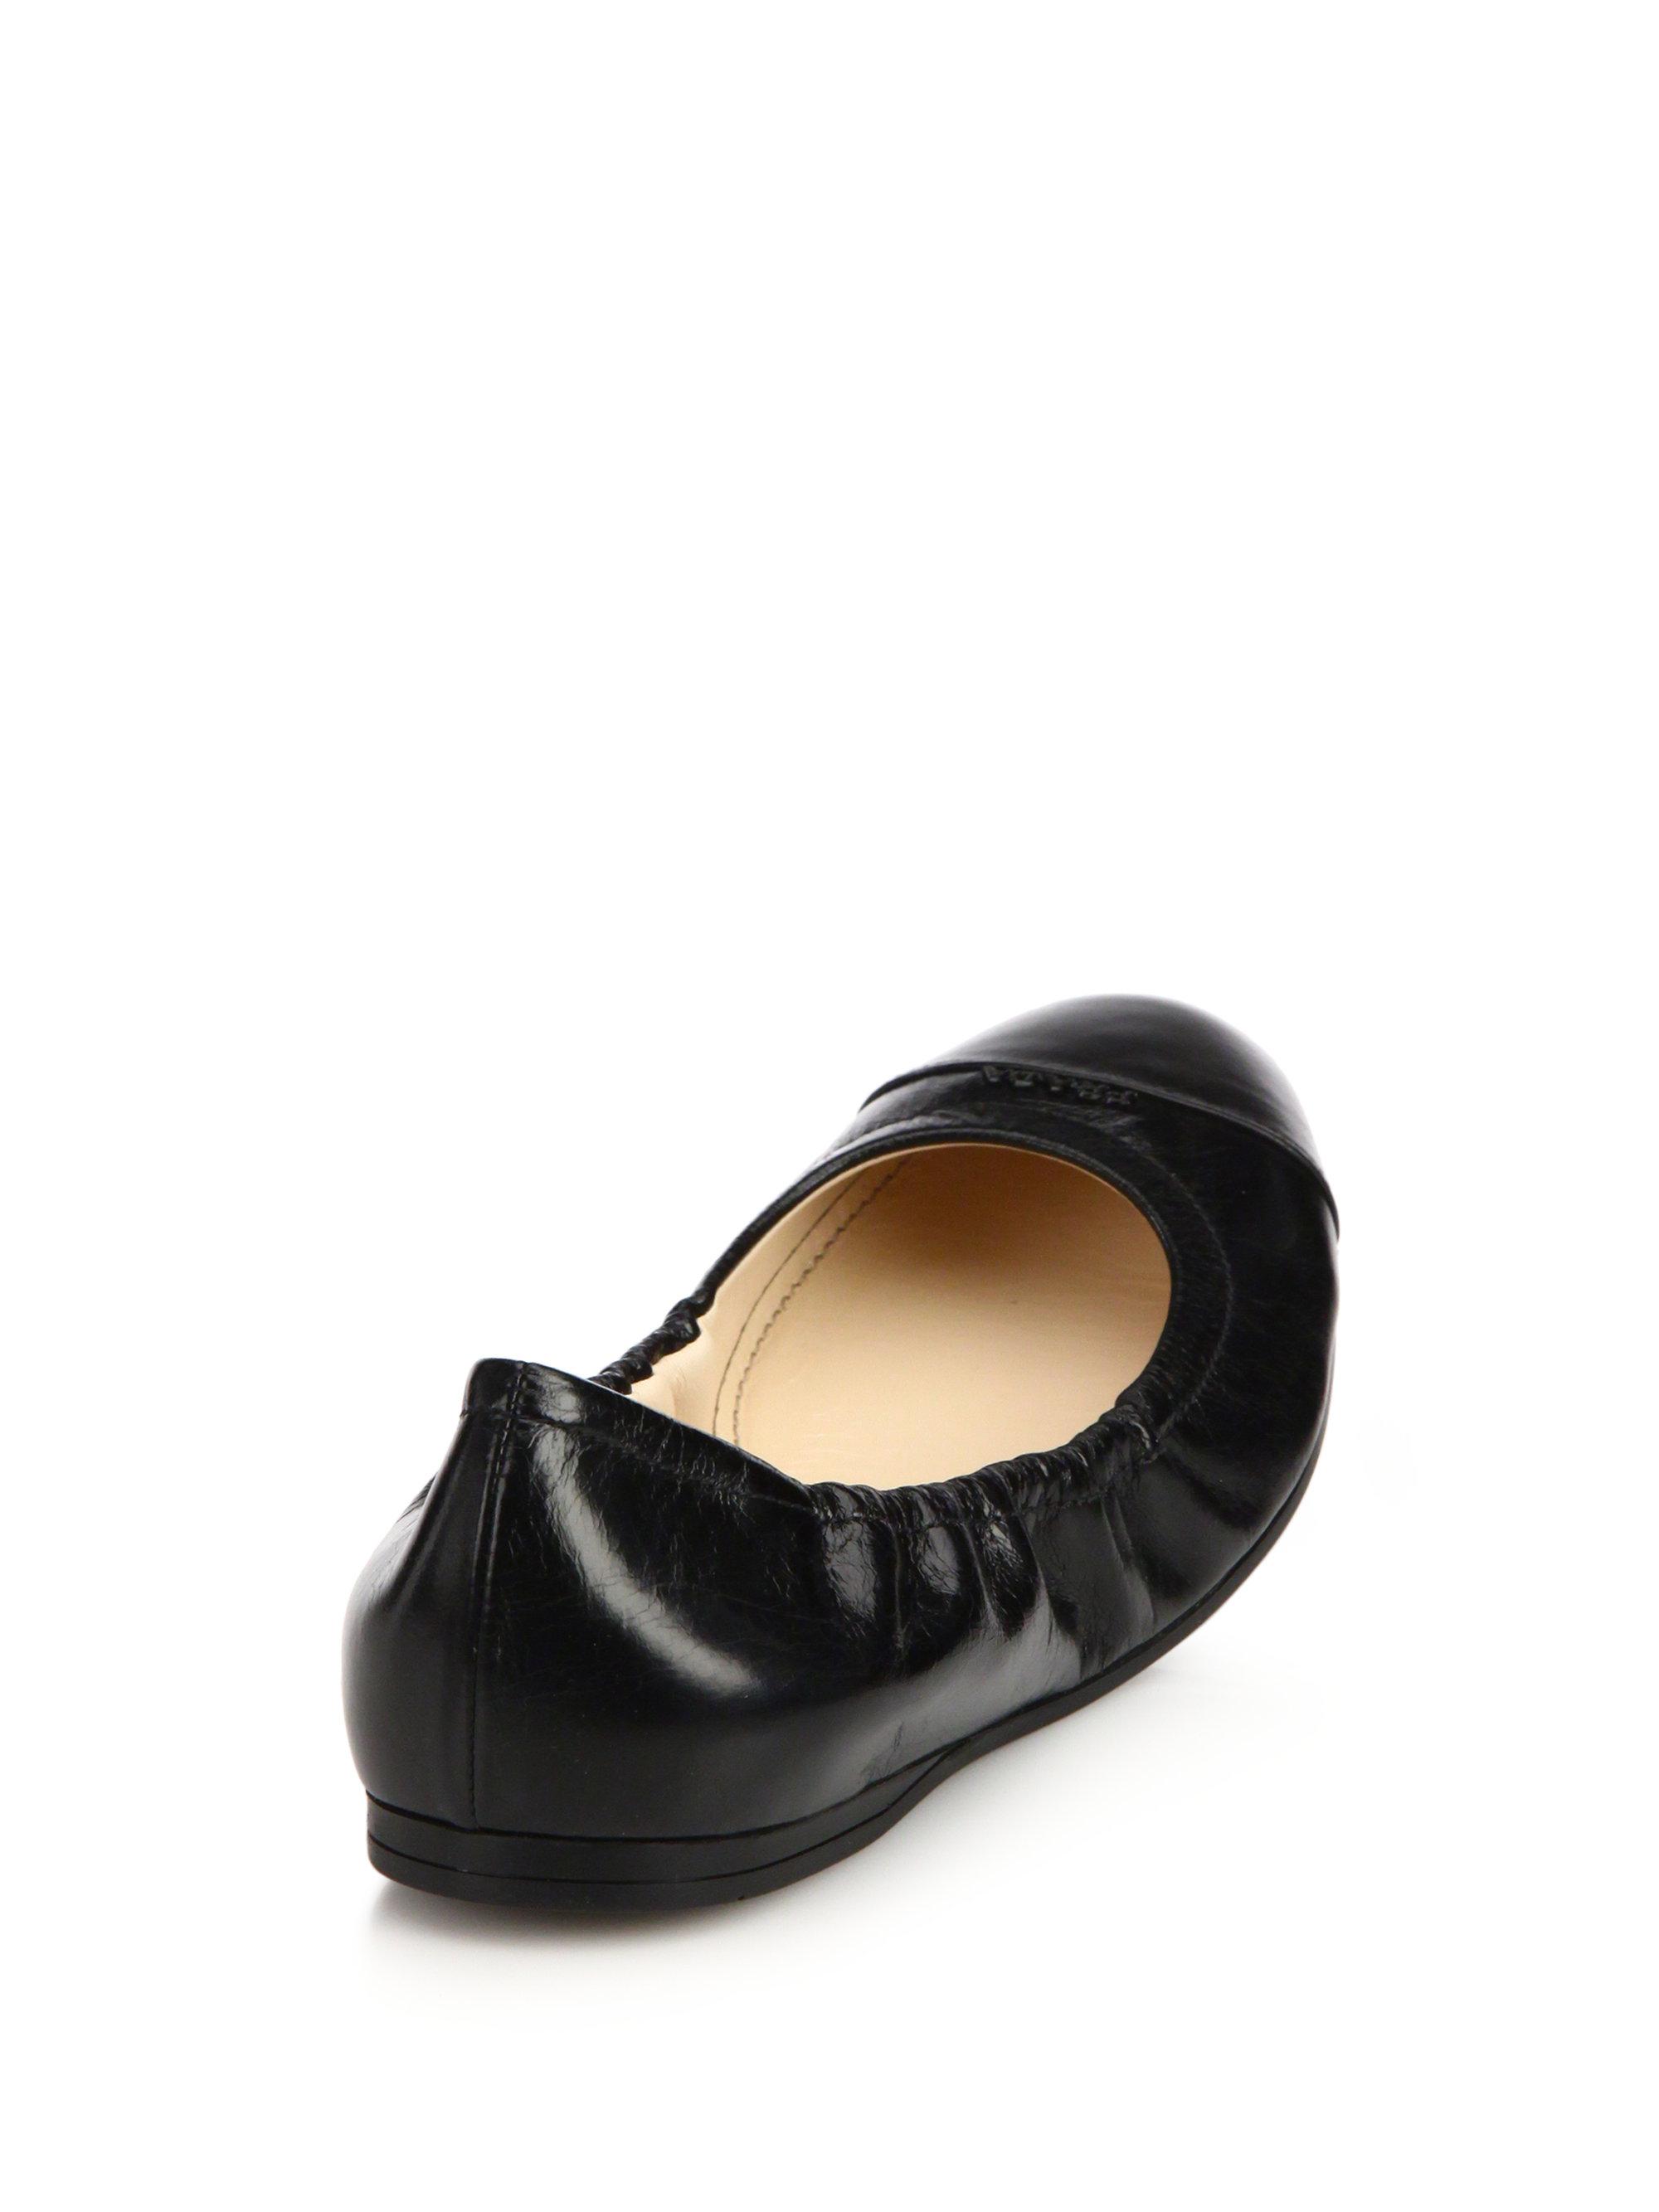 4b82daa73e Prada Leather Cap-Toe Ballet Flats in Black - Lyst